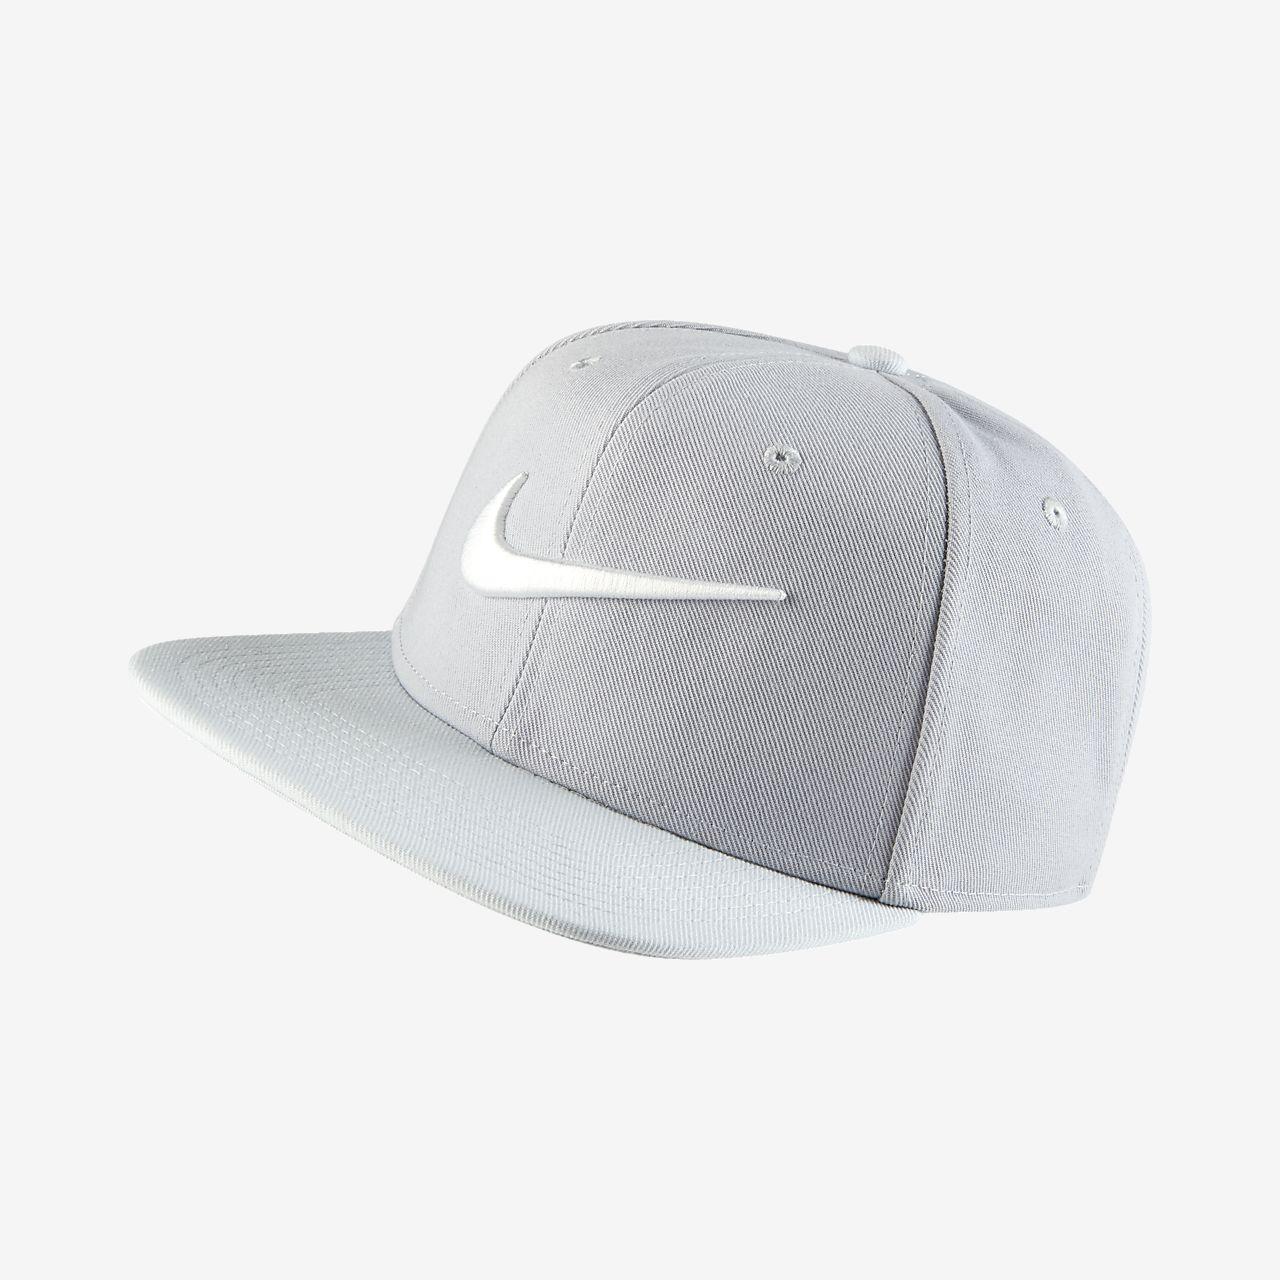 e1afd875 Nike Sportswear Pro Swoosh Adjustable Hat. Nike.com